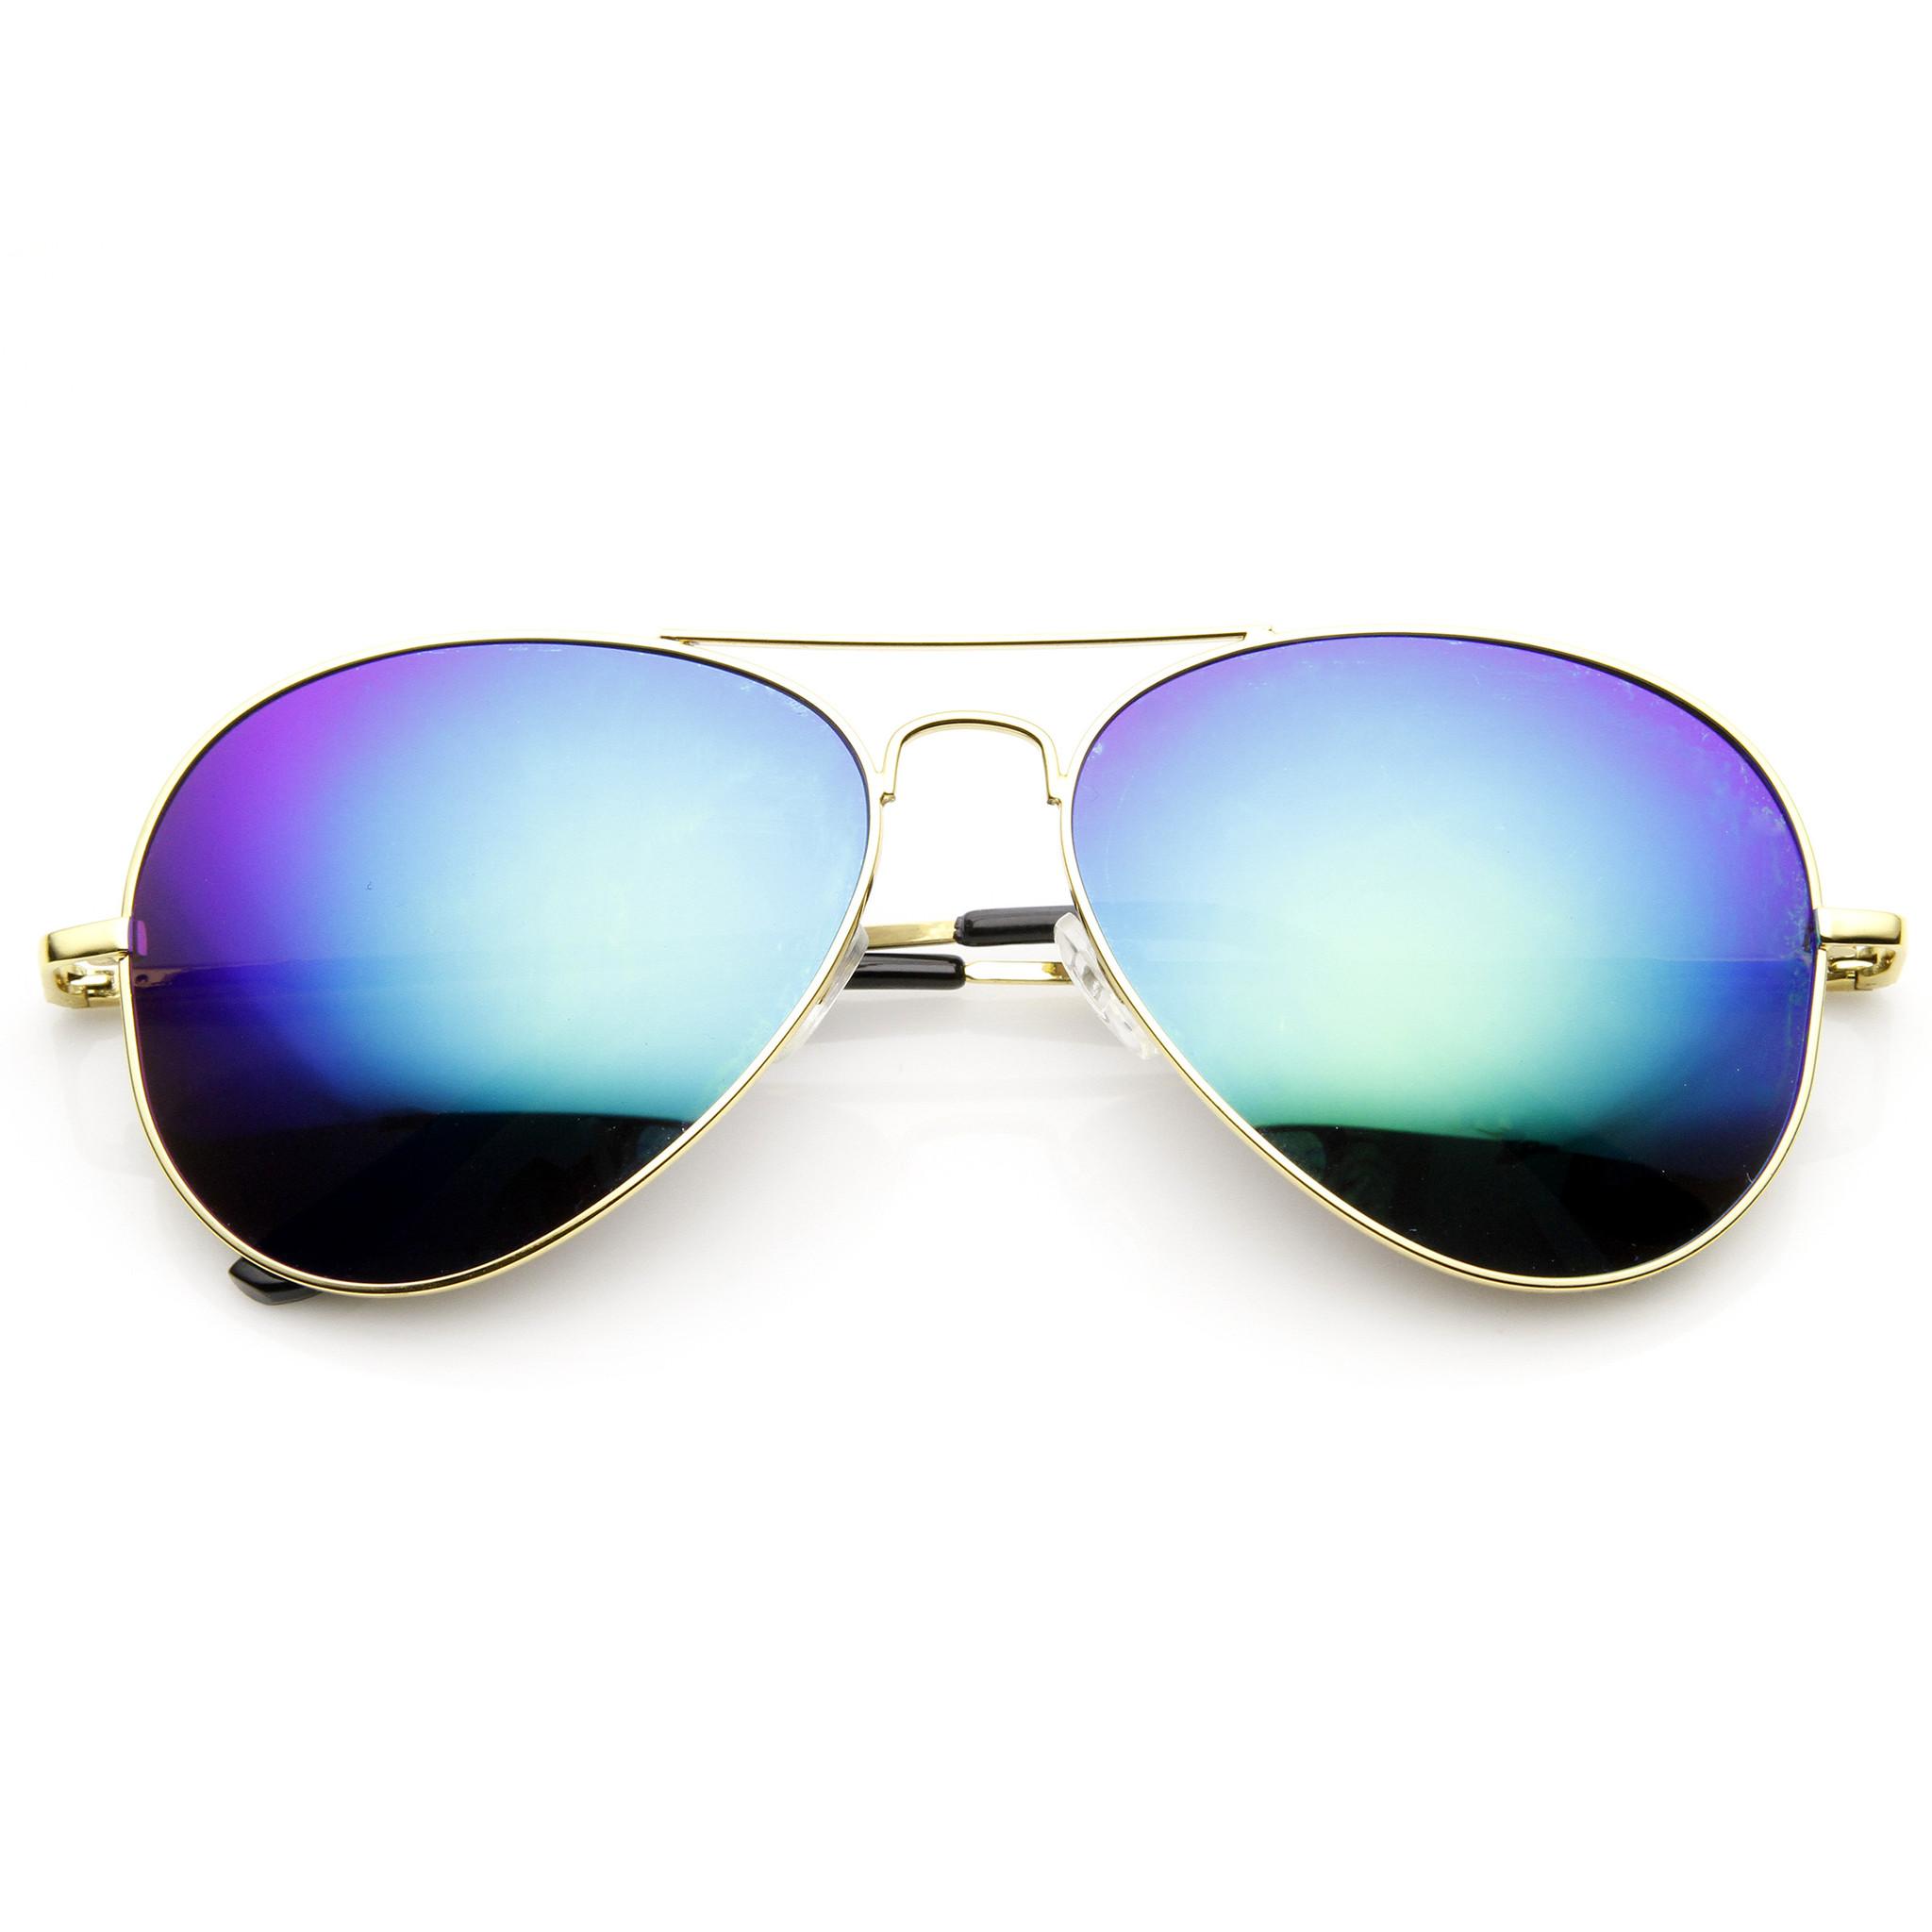 zeroUV sunglasses